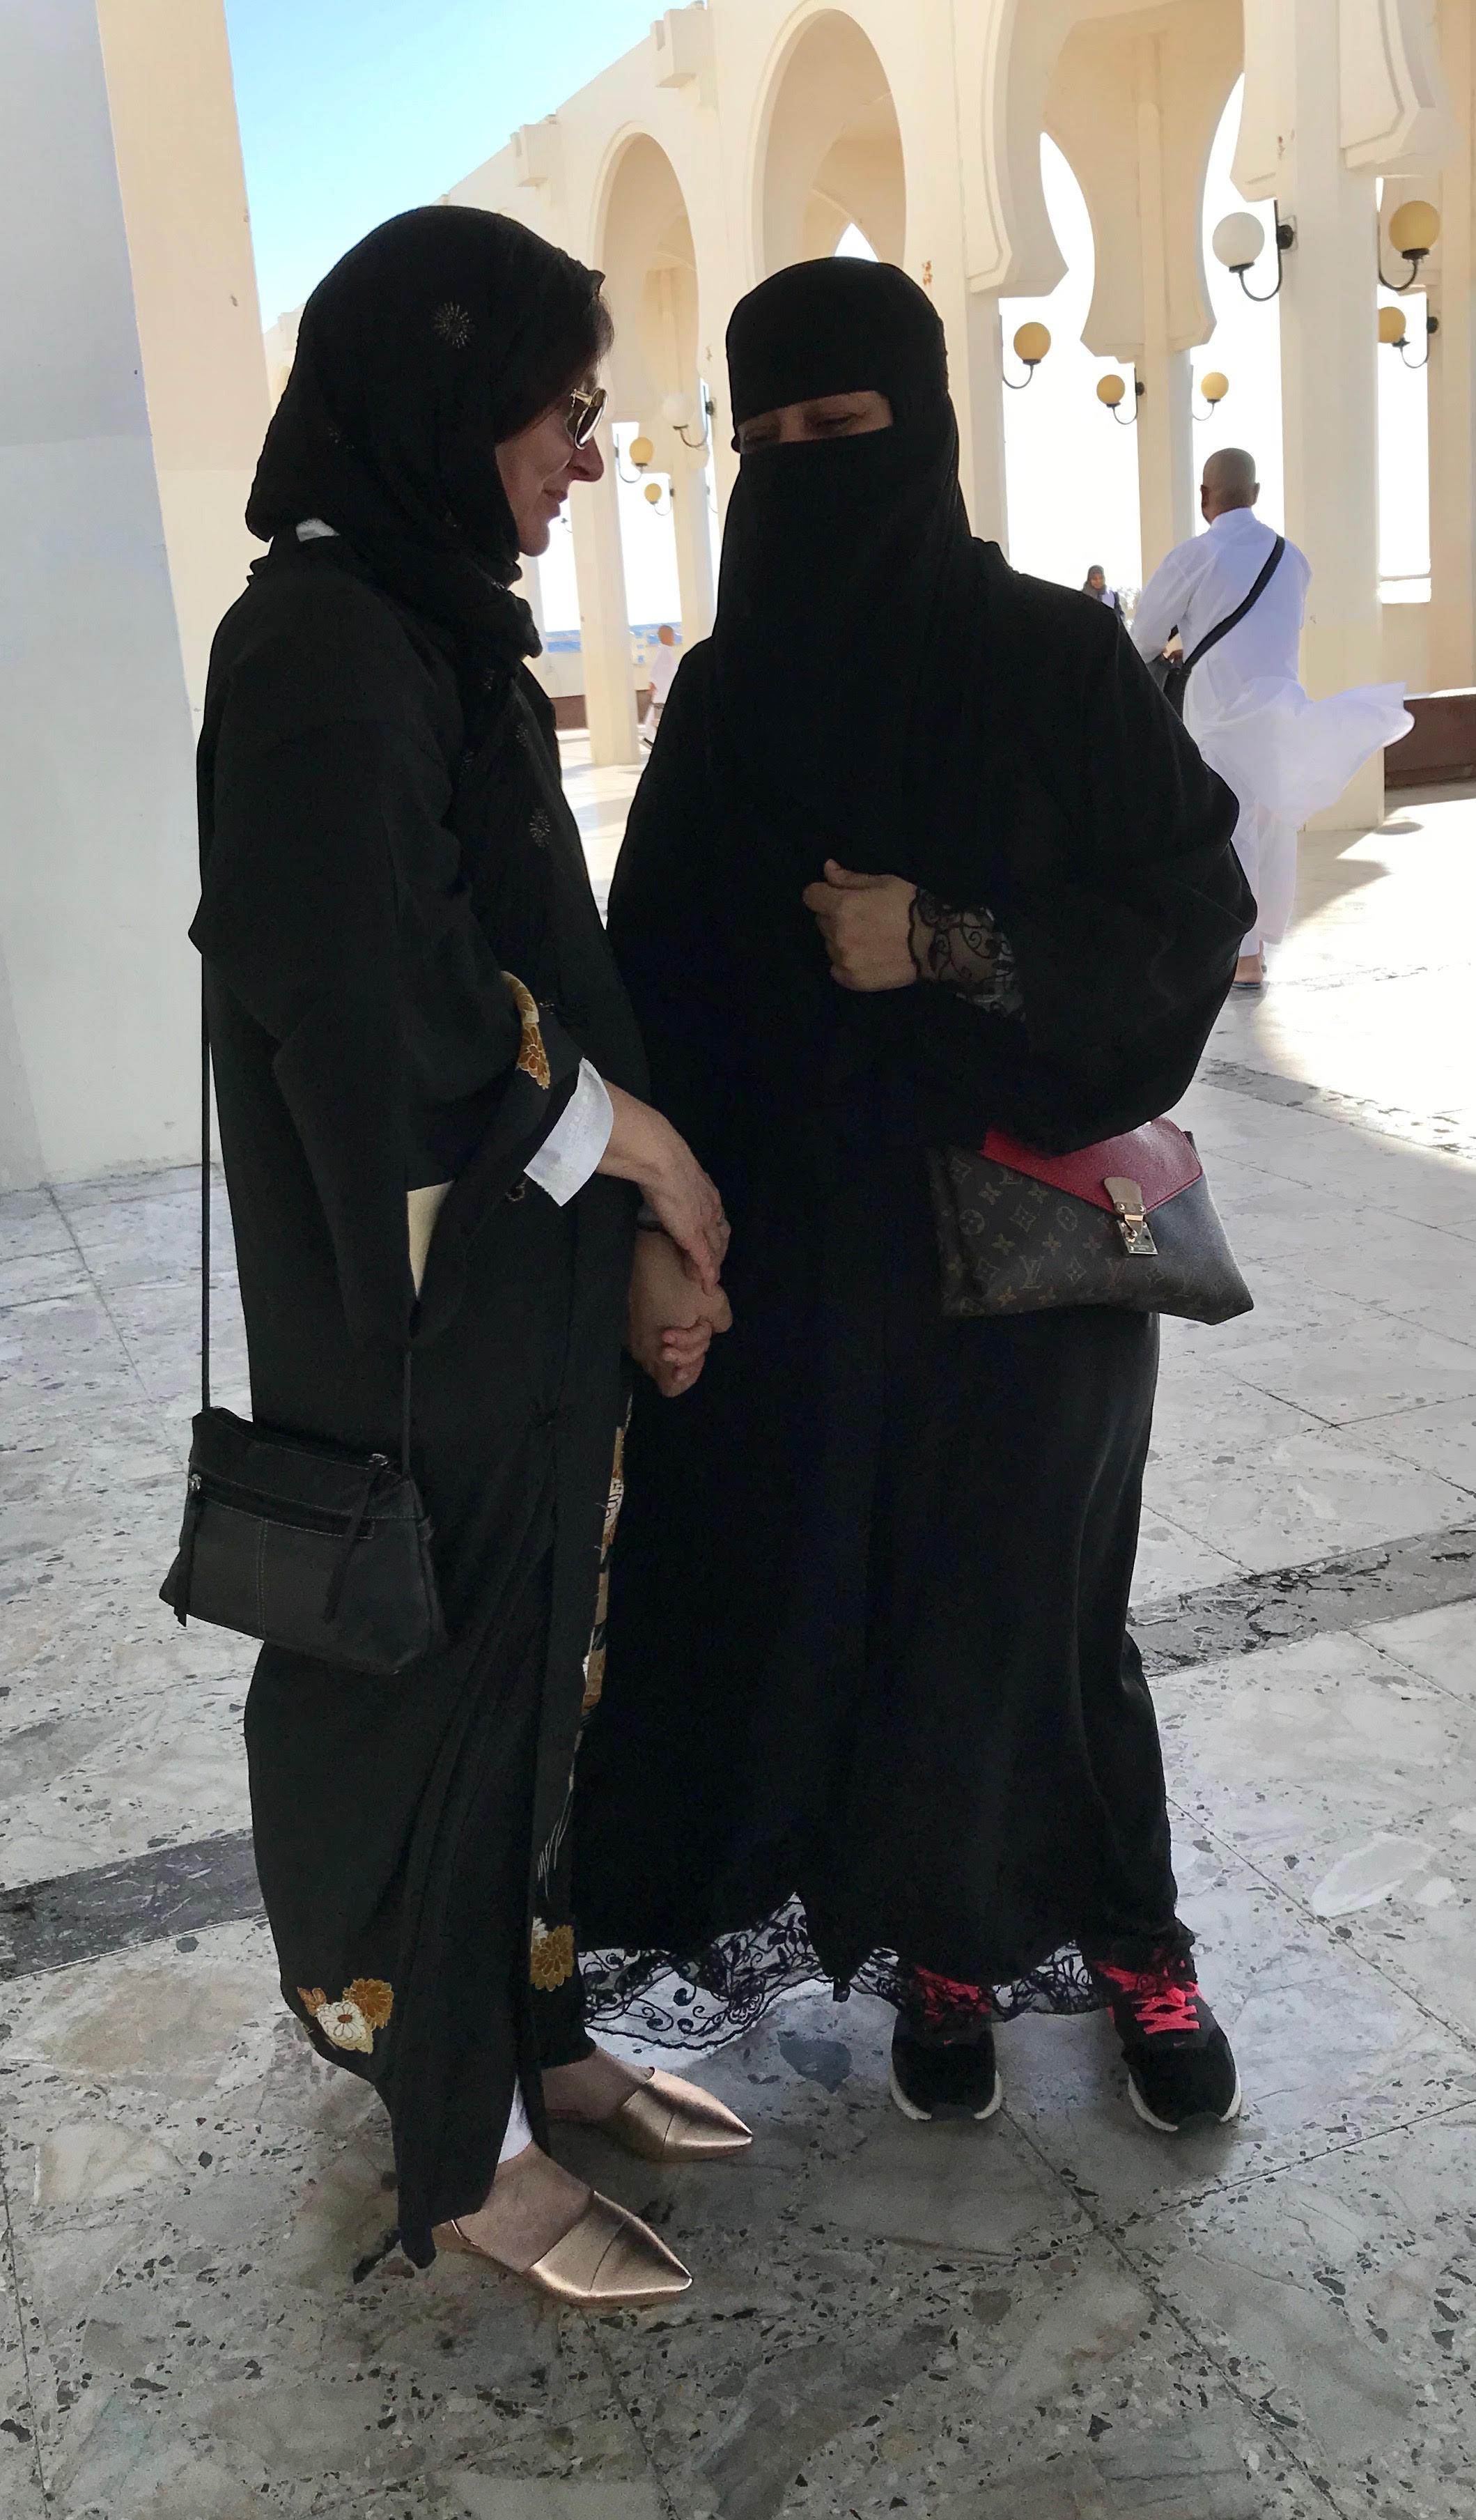 MAKING FRIENDS IN JEDDAH, SAUDI ARABIA Photo by TK Feissner   (TOP: ISLAND MOSQUE, JEDDAH, SAUDI ARABIA Photo by Lisa Feissner)